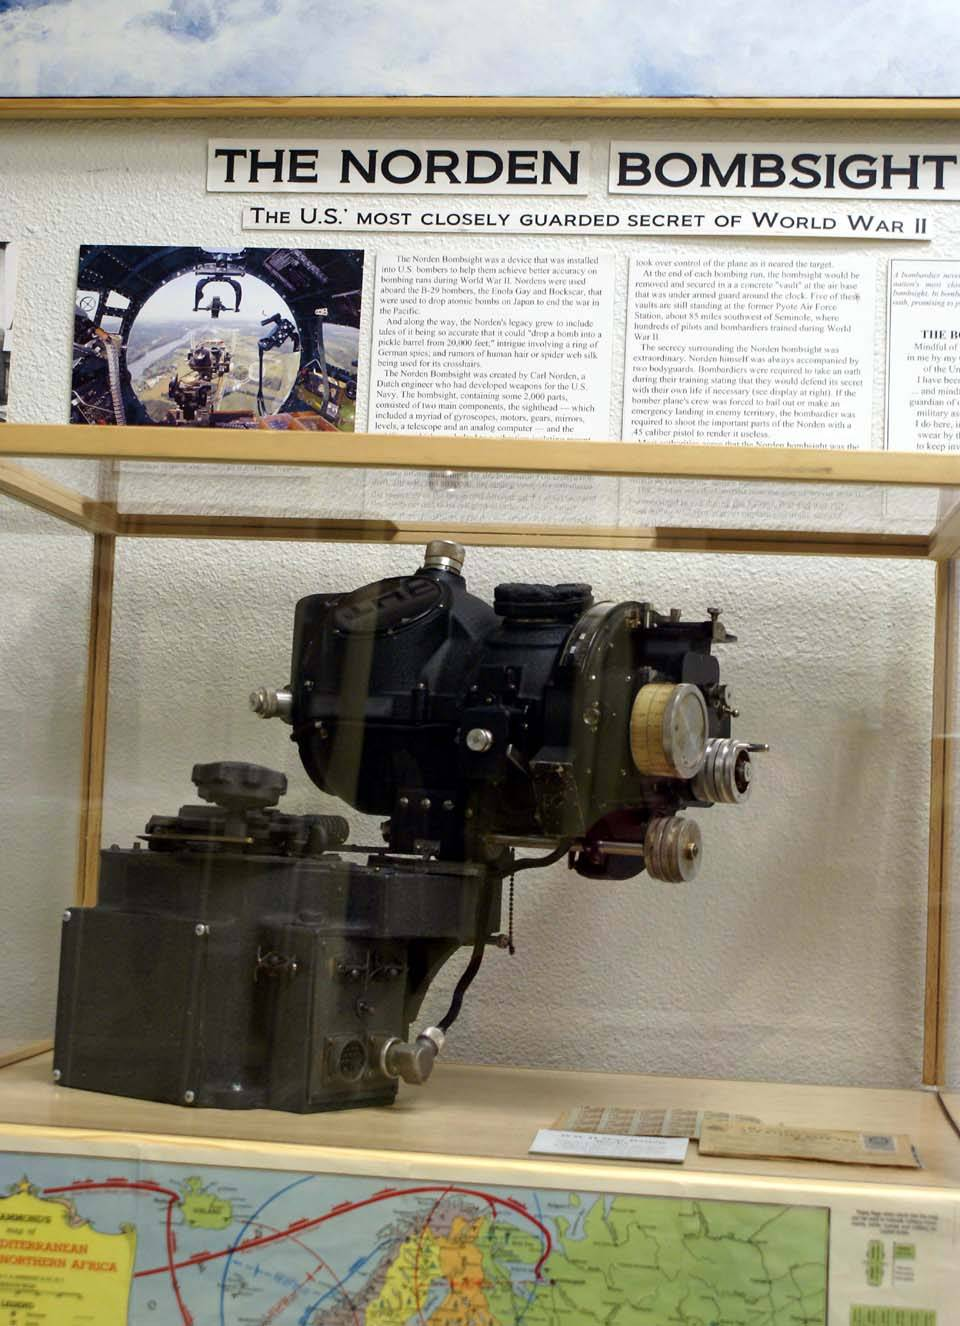 The Norden Bombsight